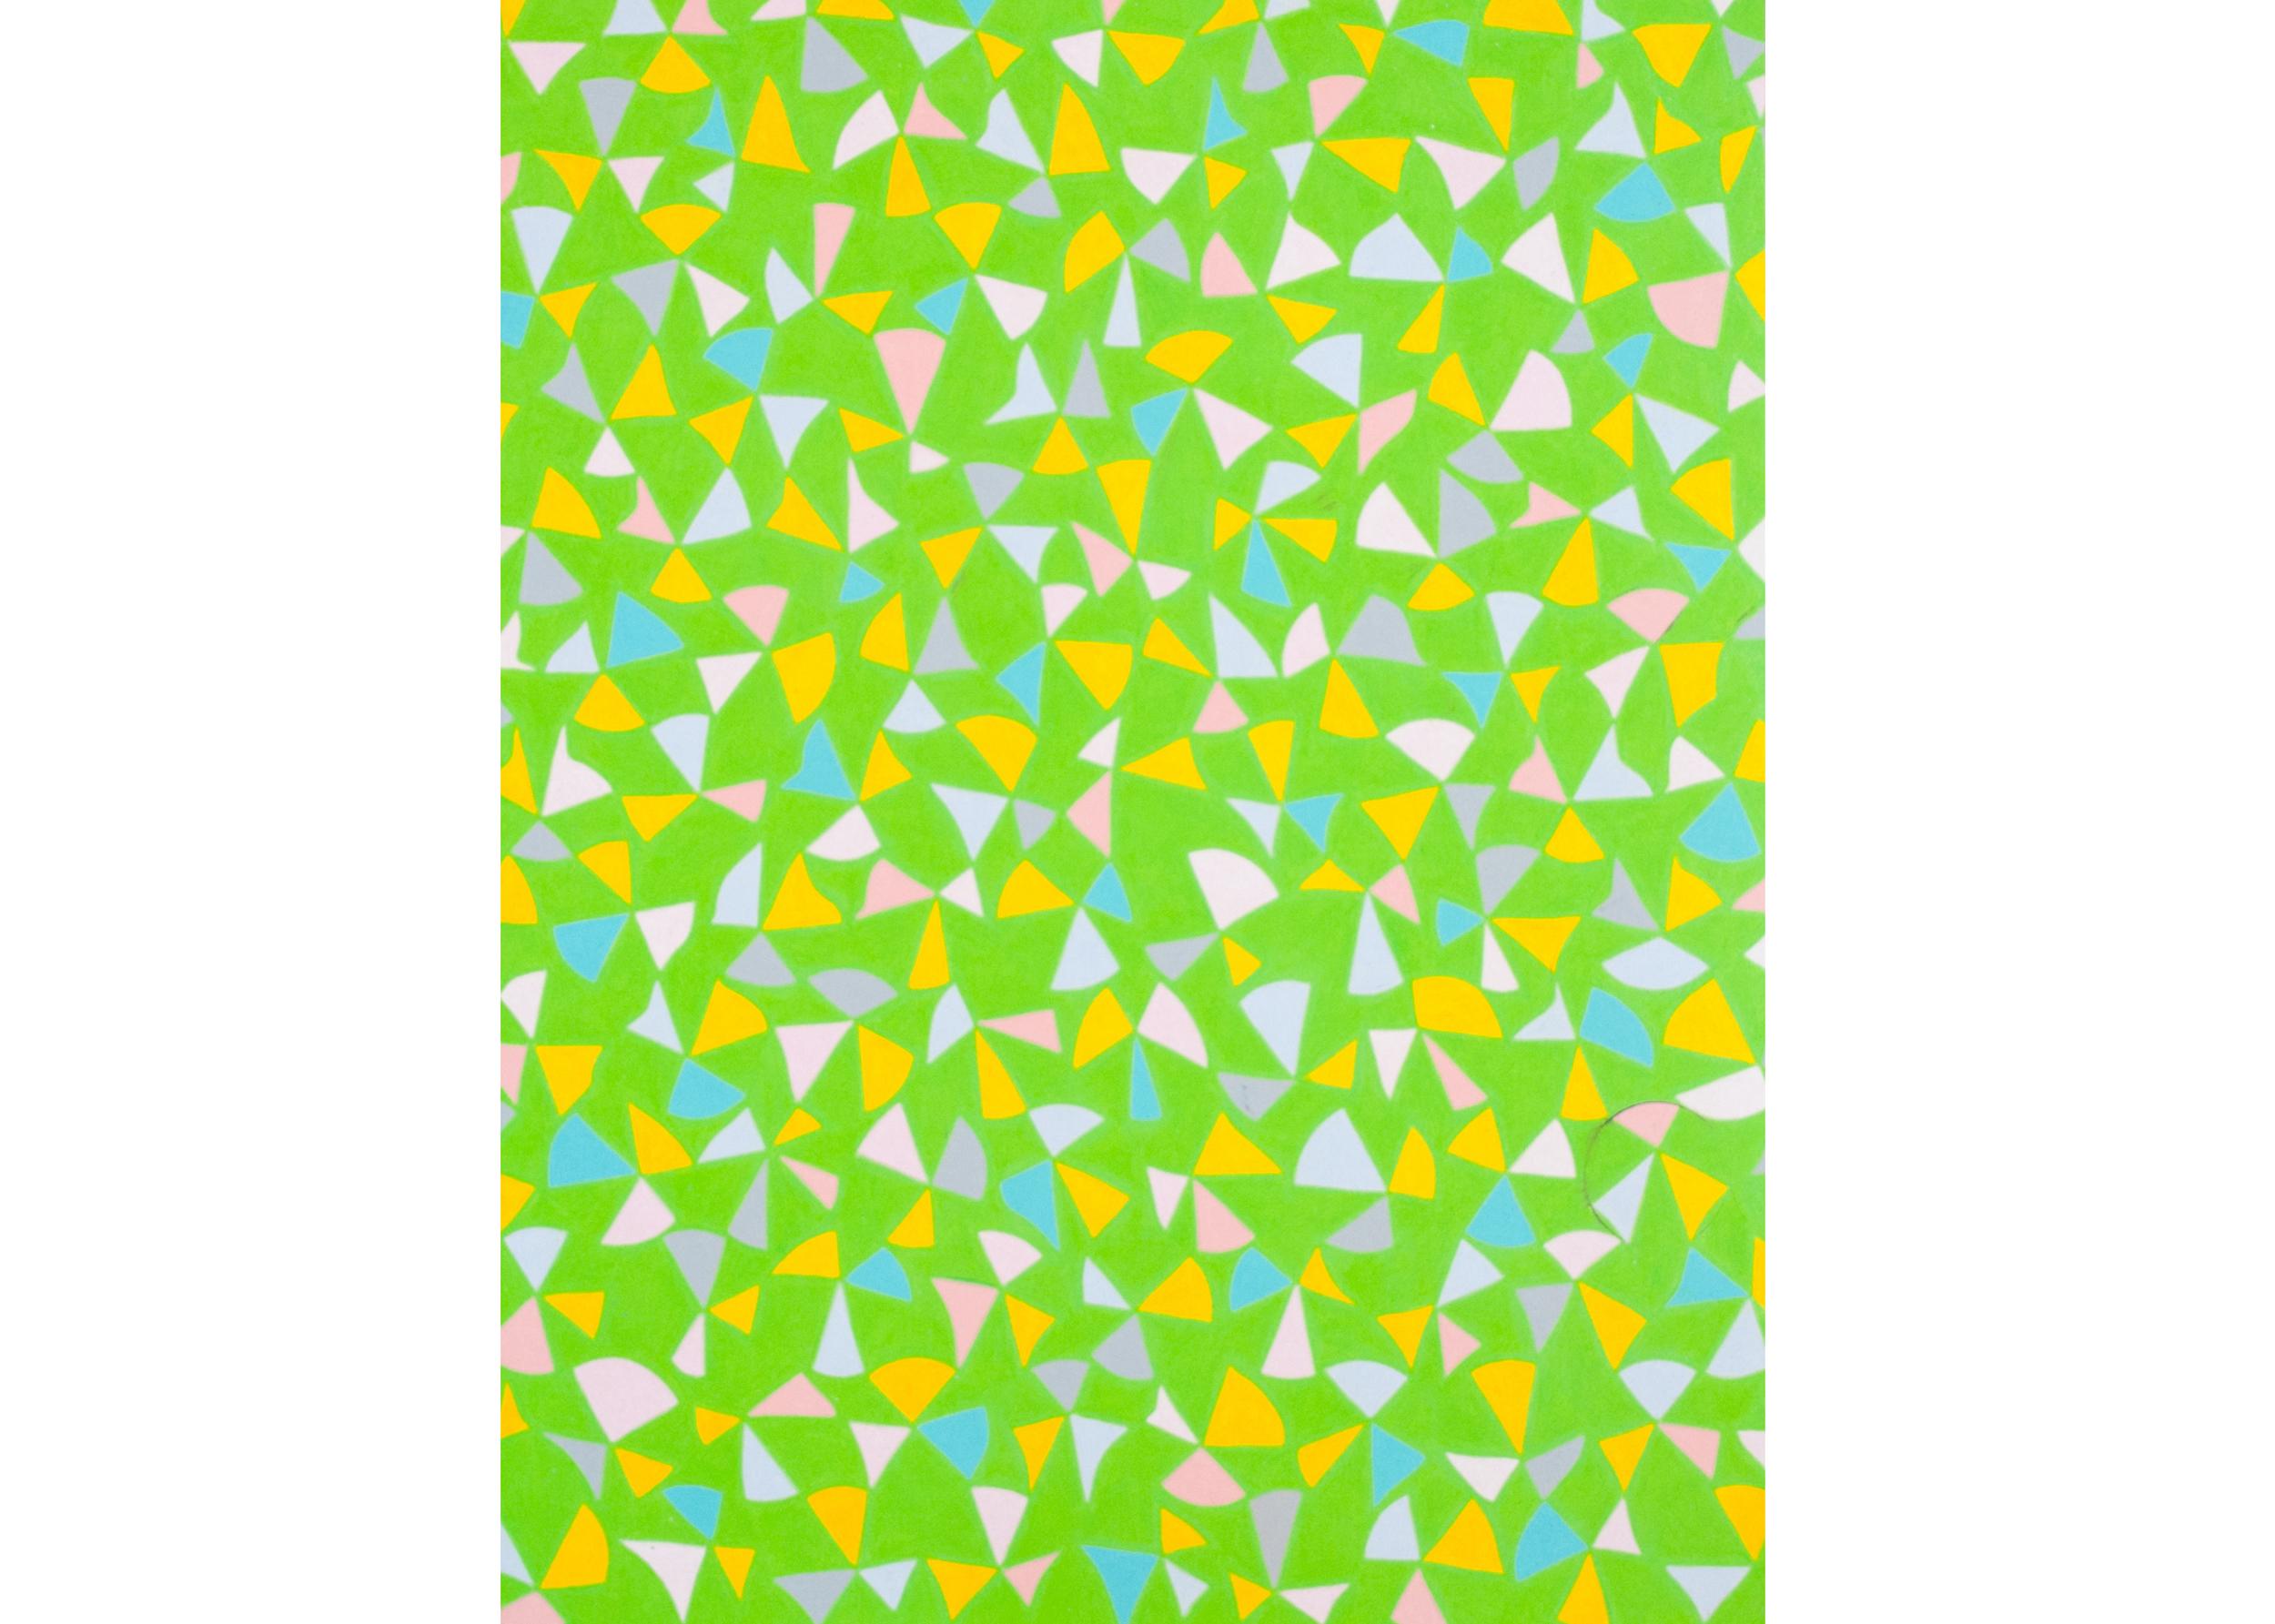 Untitled (Seirpinski Matrix), 2011, color pencil on paper, 22 x 16 in.